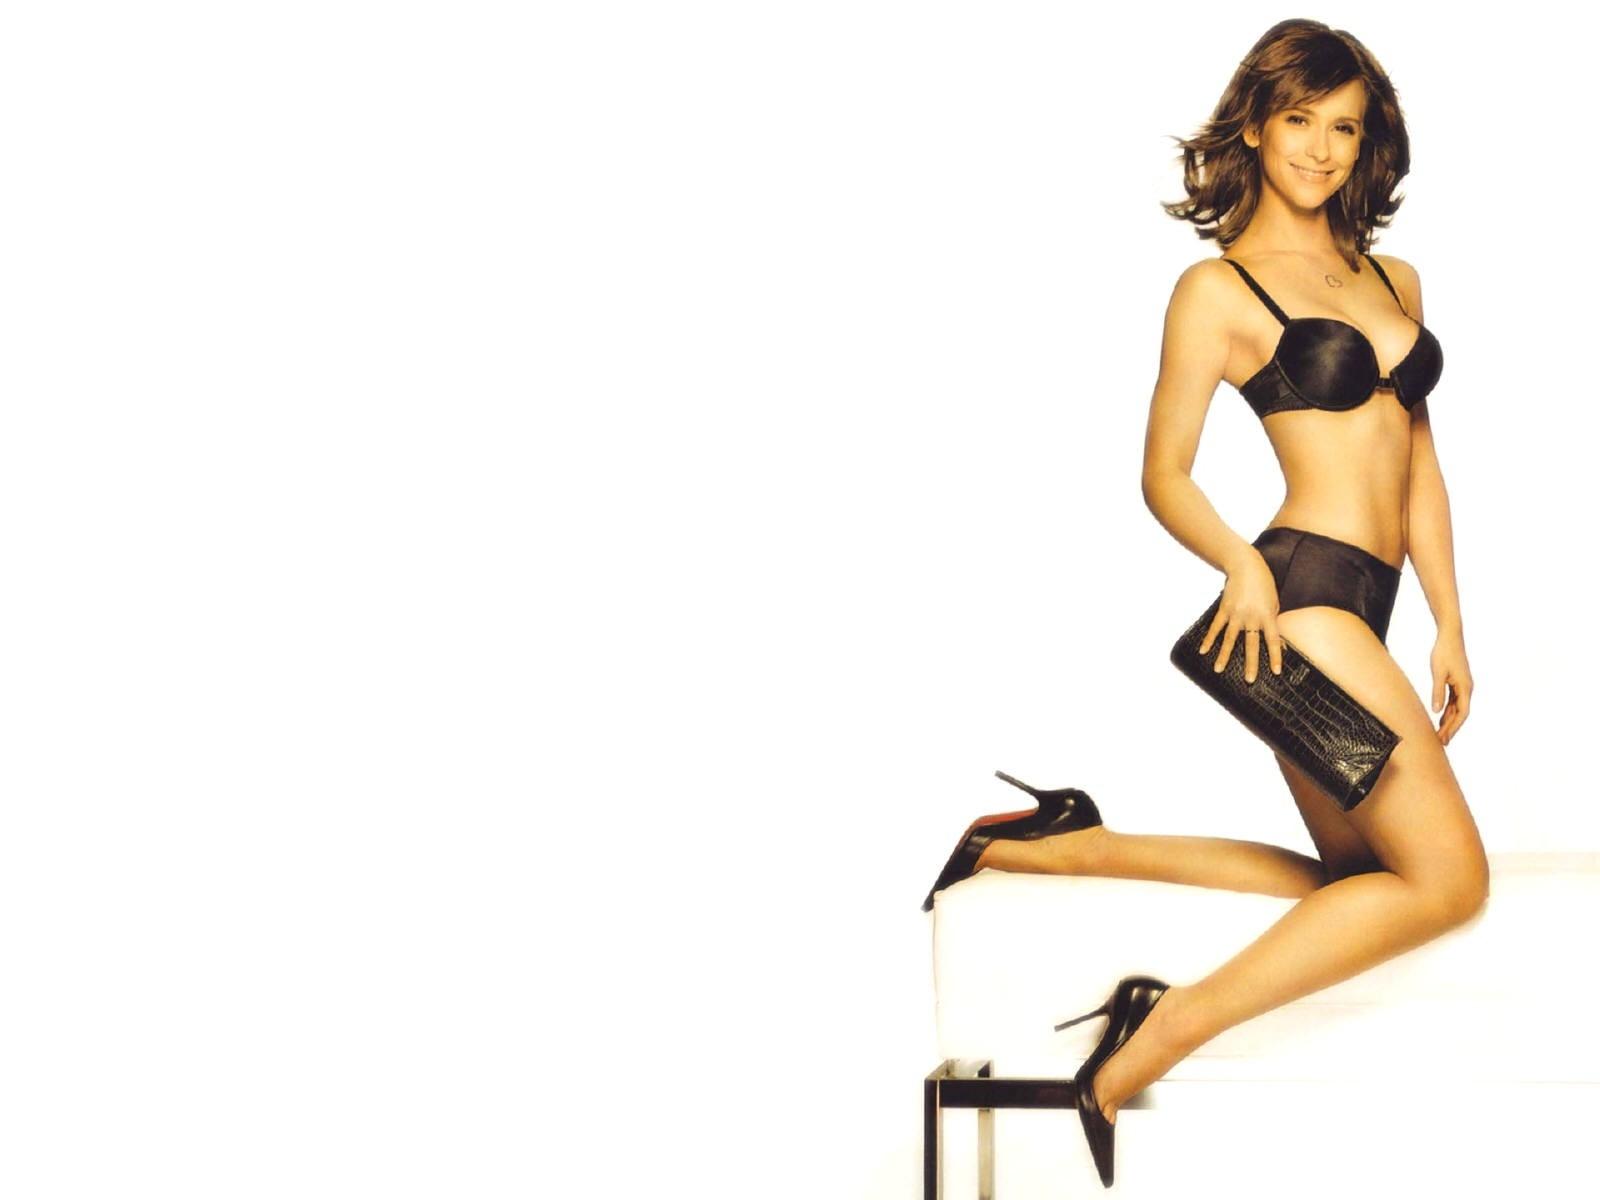 Wallpaper - tacchi a spillo e lingerie per Jennifer Love Hewitt